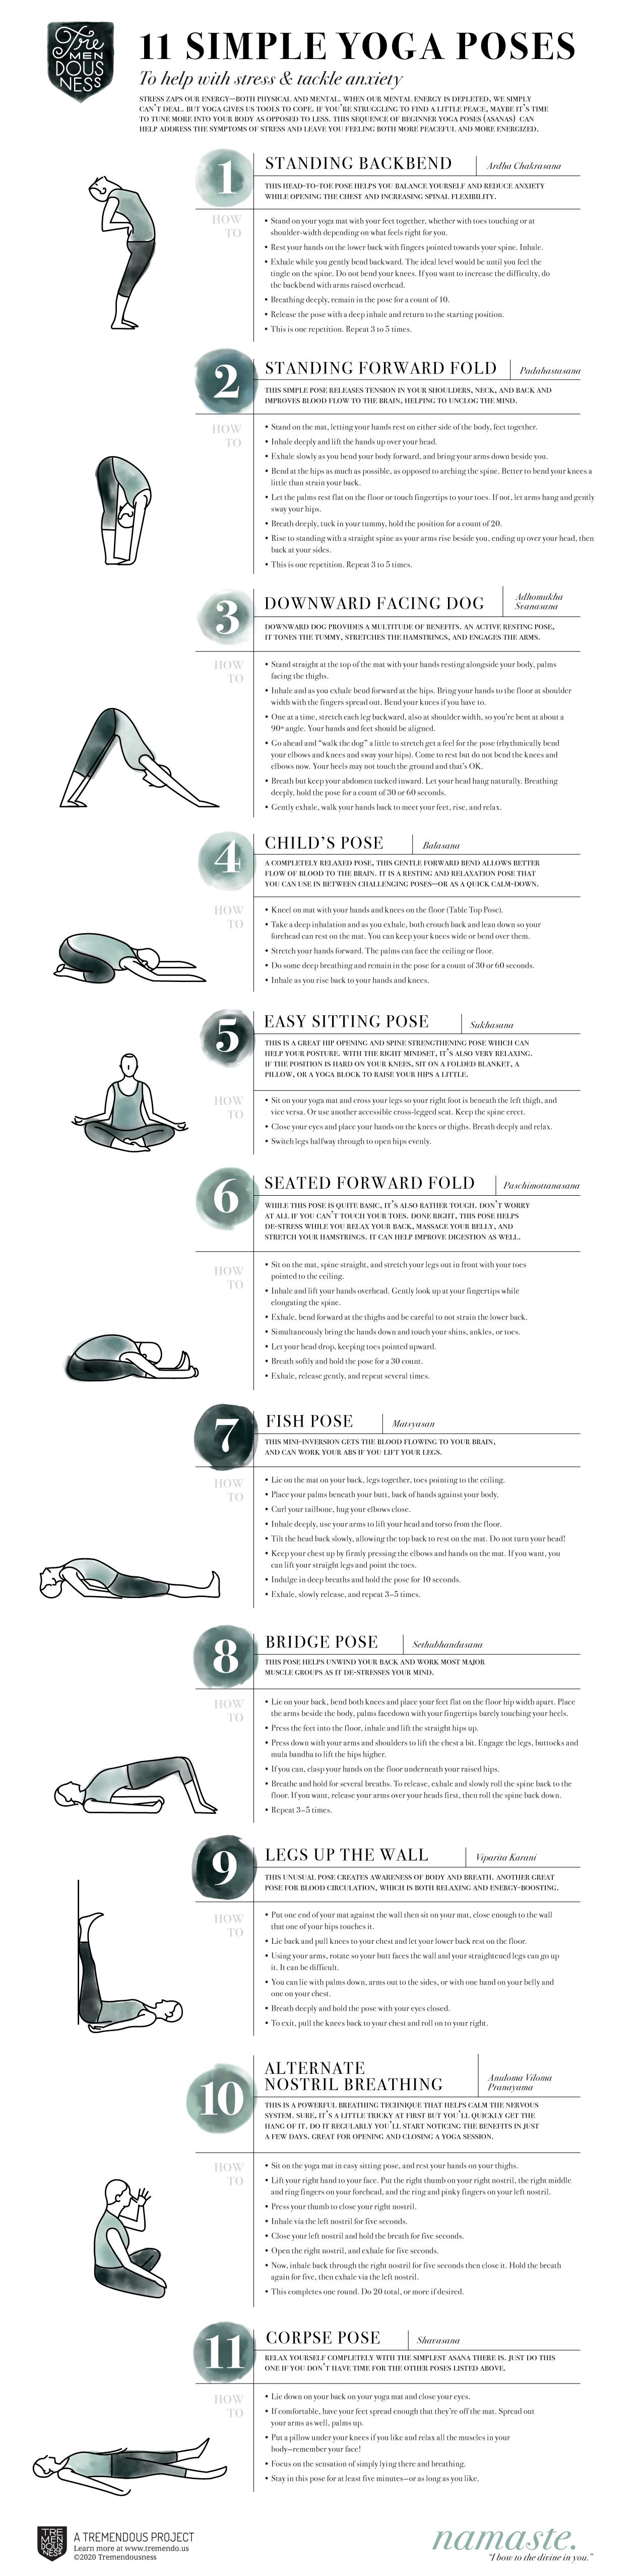 stress_yoga_blog_02_scrolling